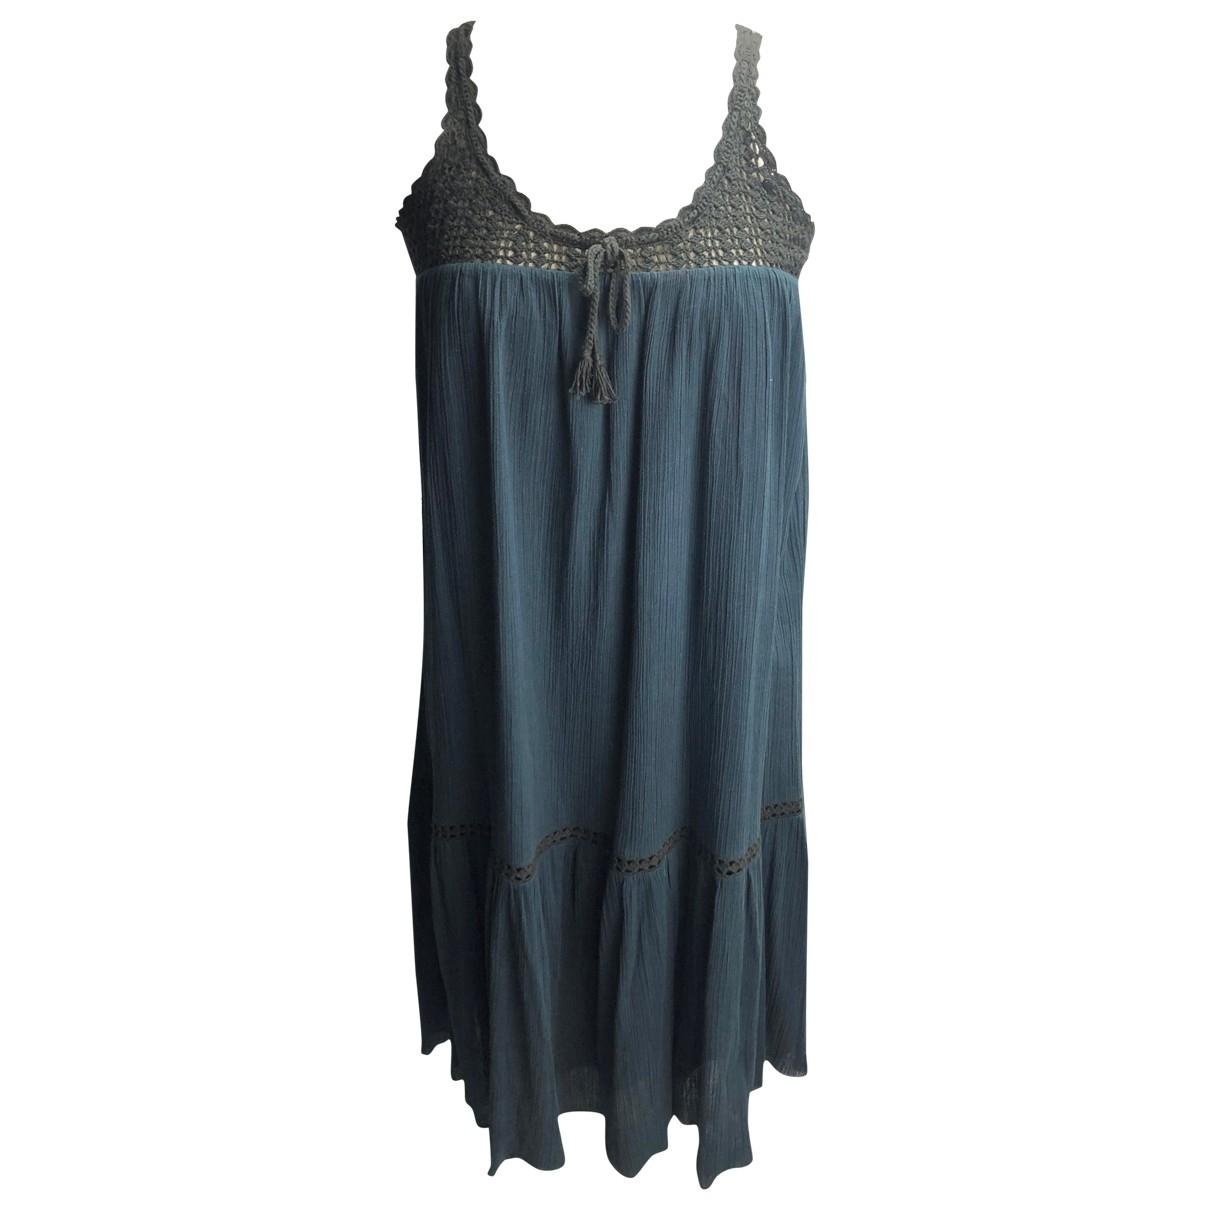 Bonpoint \N Black Cotton dress for Women S International